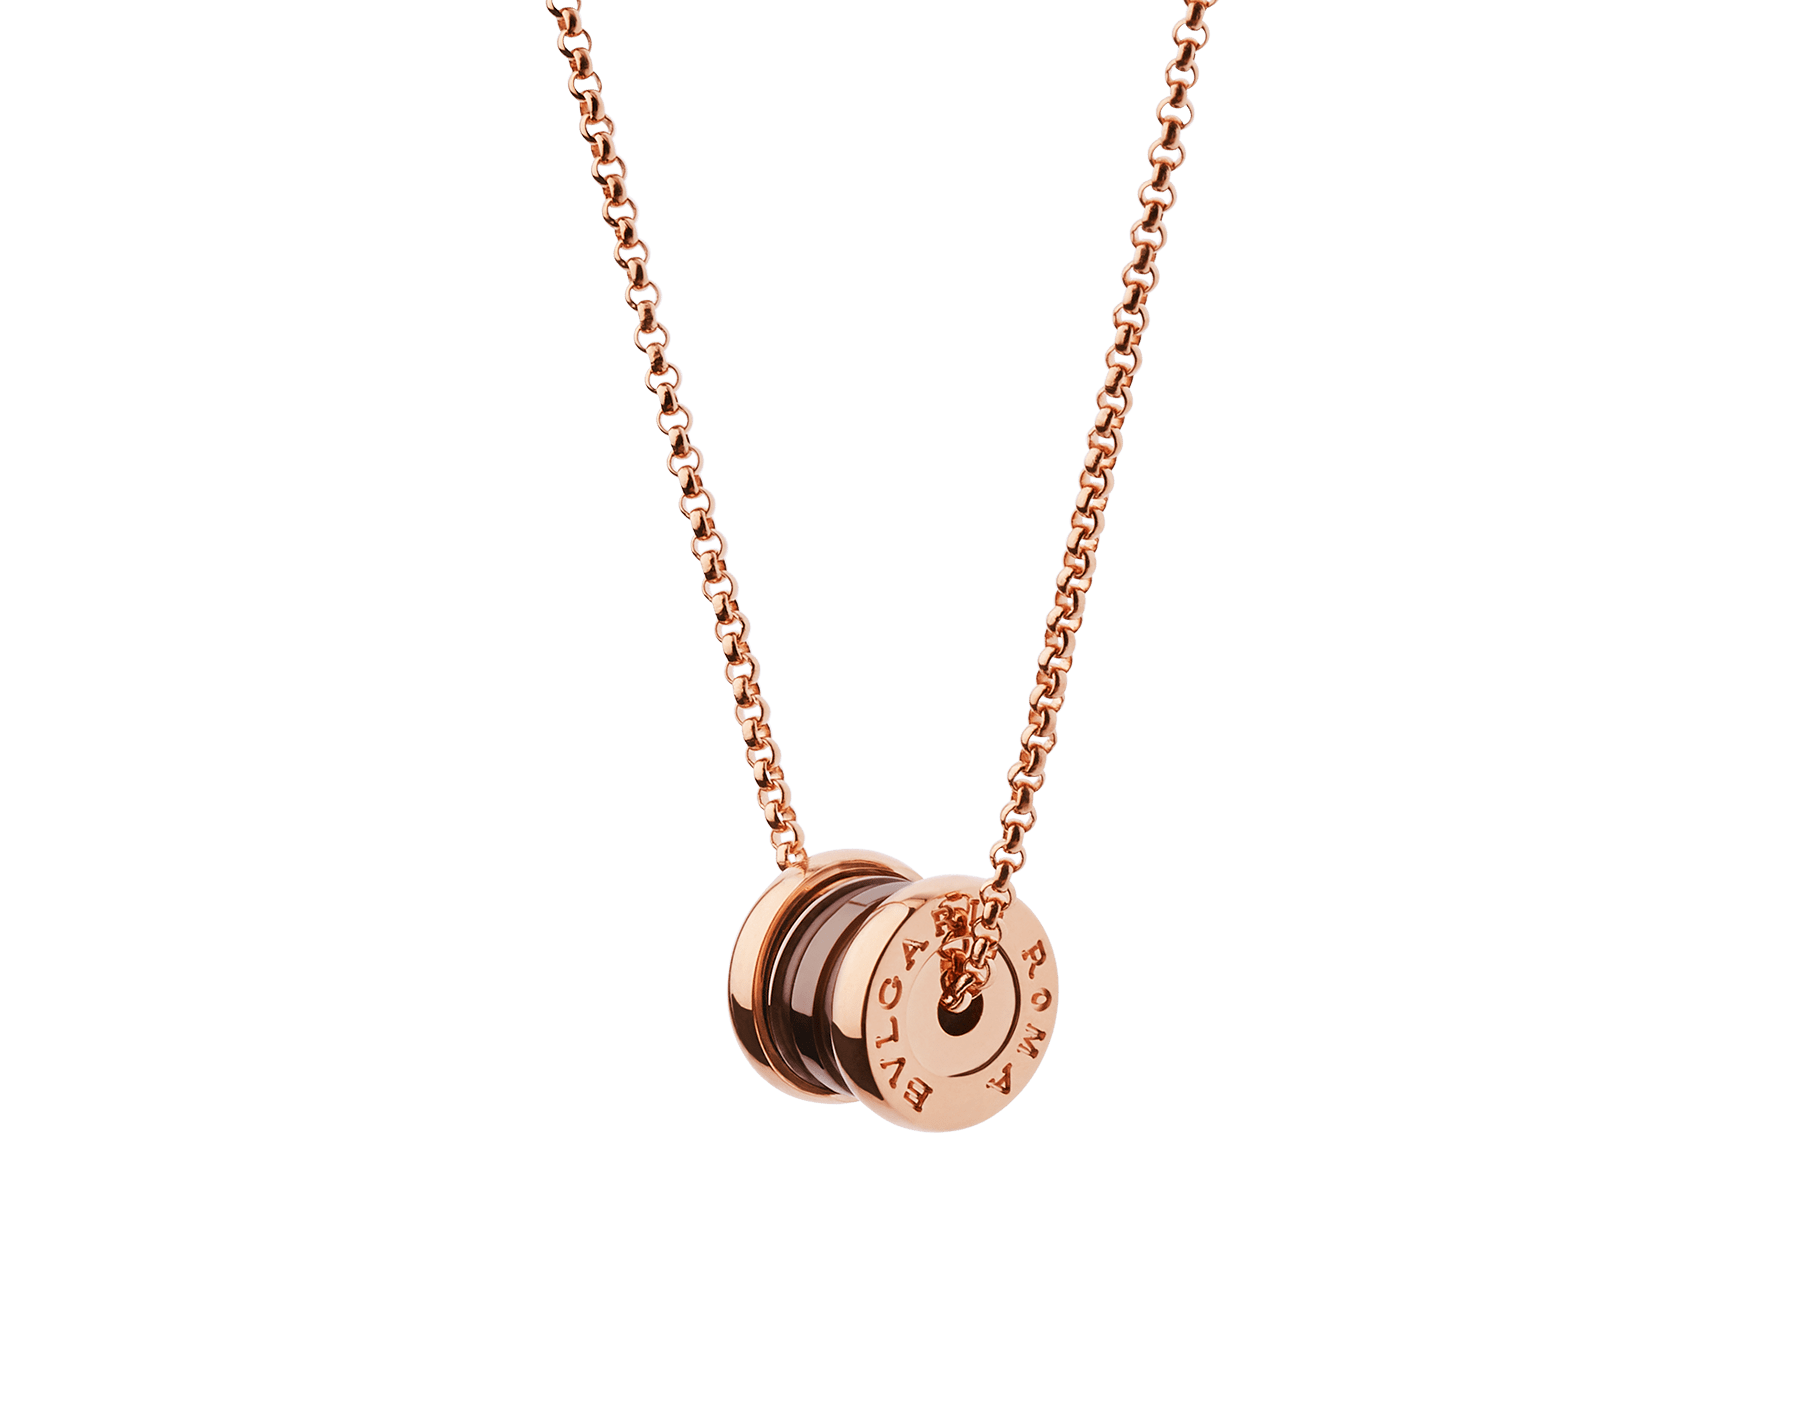 B.zero1 項鍊,18K 玫瑰金鍊帶,18K 玫瑰金項墜鑲飾金屬瓷。 353004 image 1